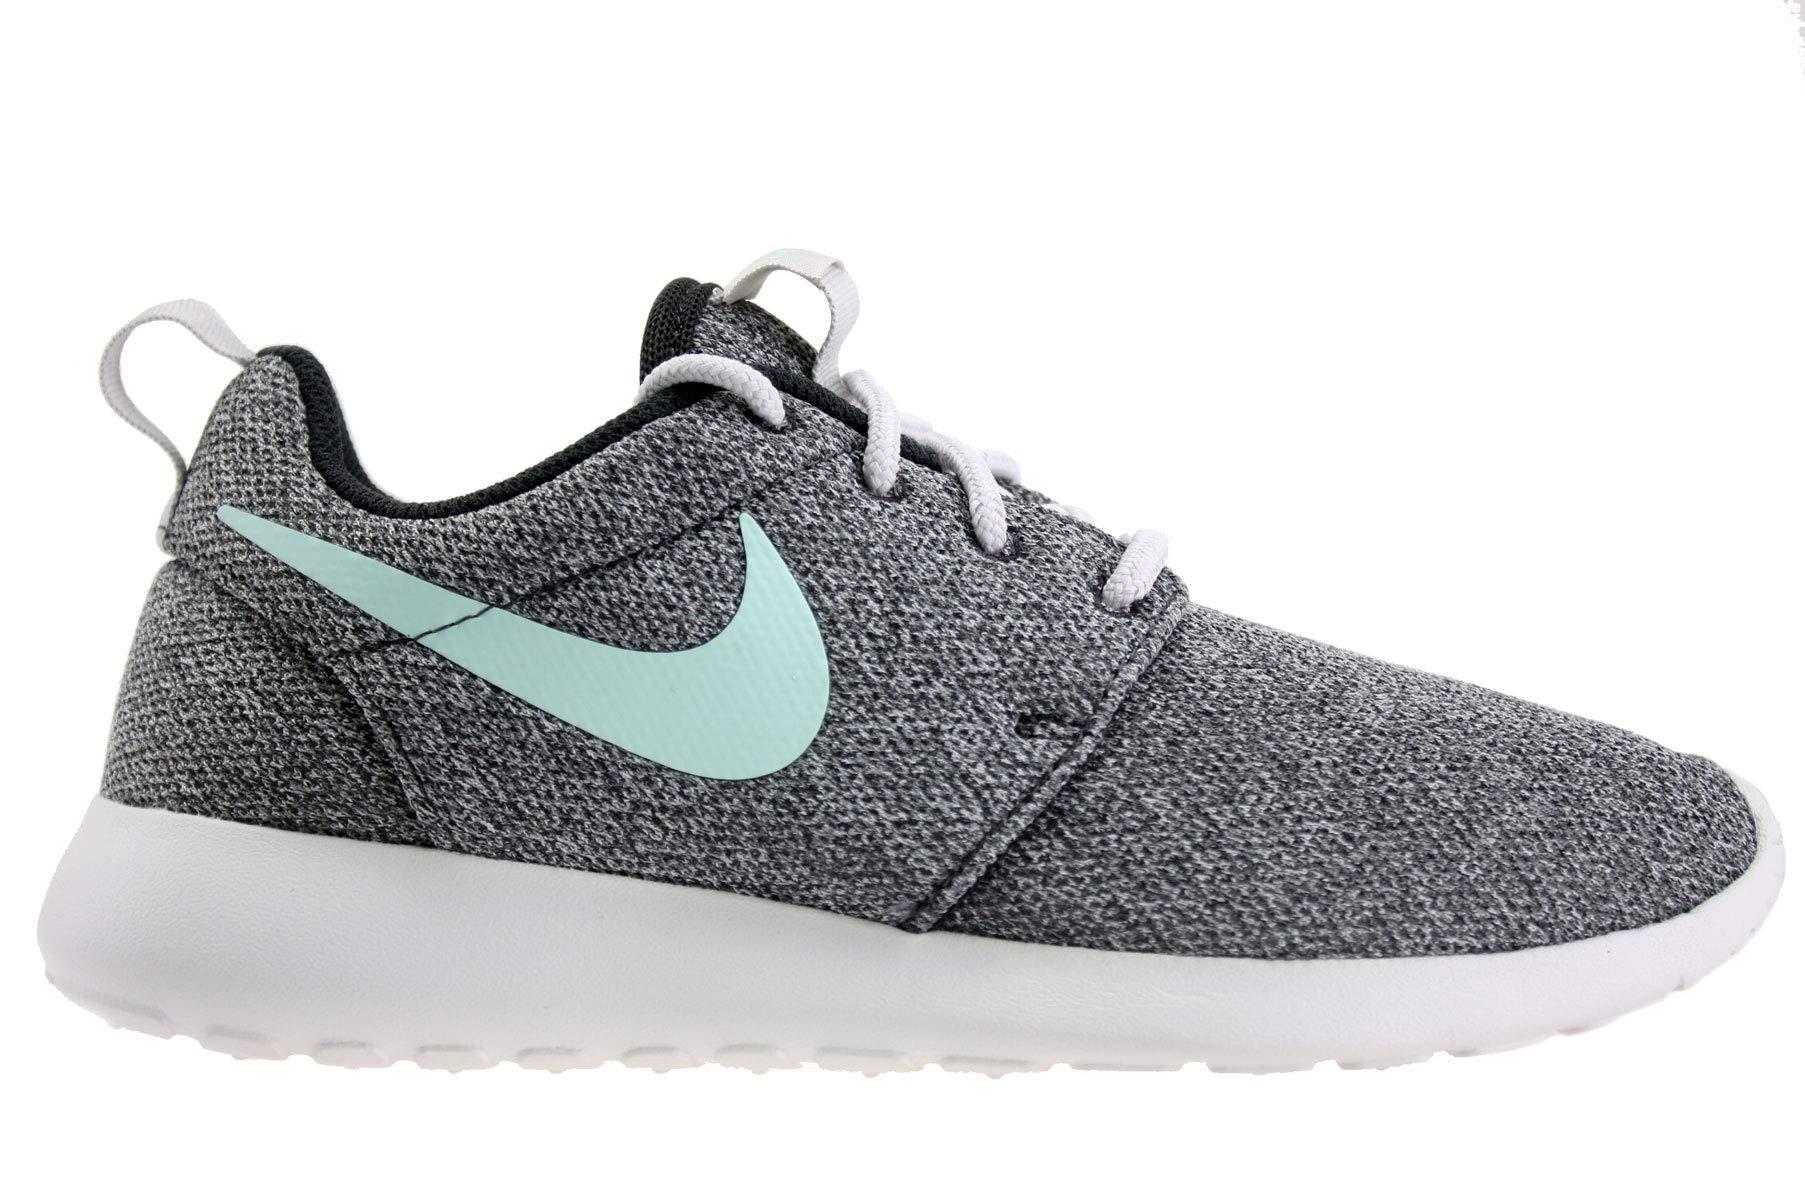 f244a24fa2c78 NIKE Womens Roshe One Running Shoes Oil Grey Igloo Summit White 844994-009  Size 6.5